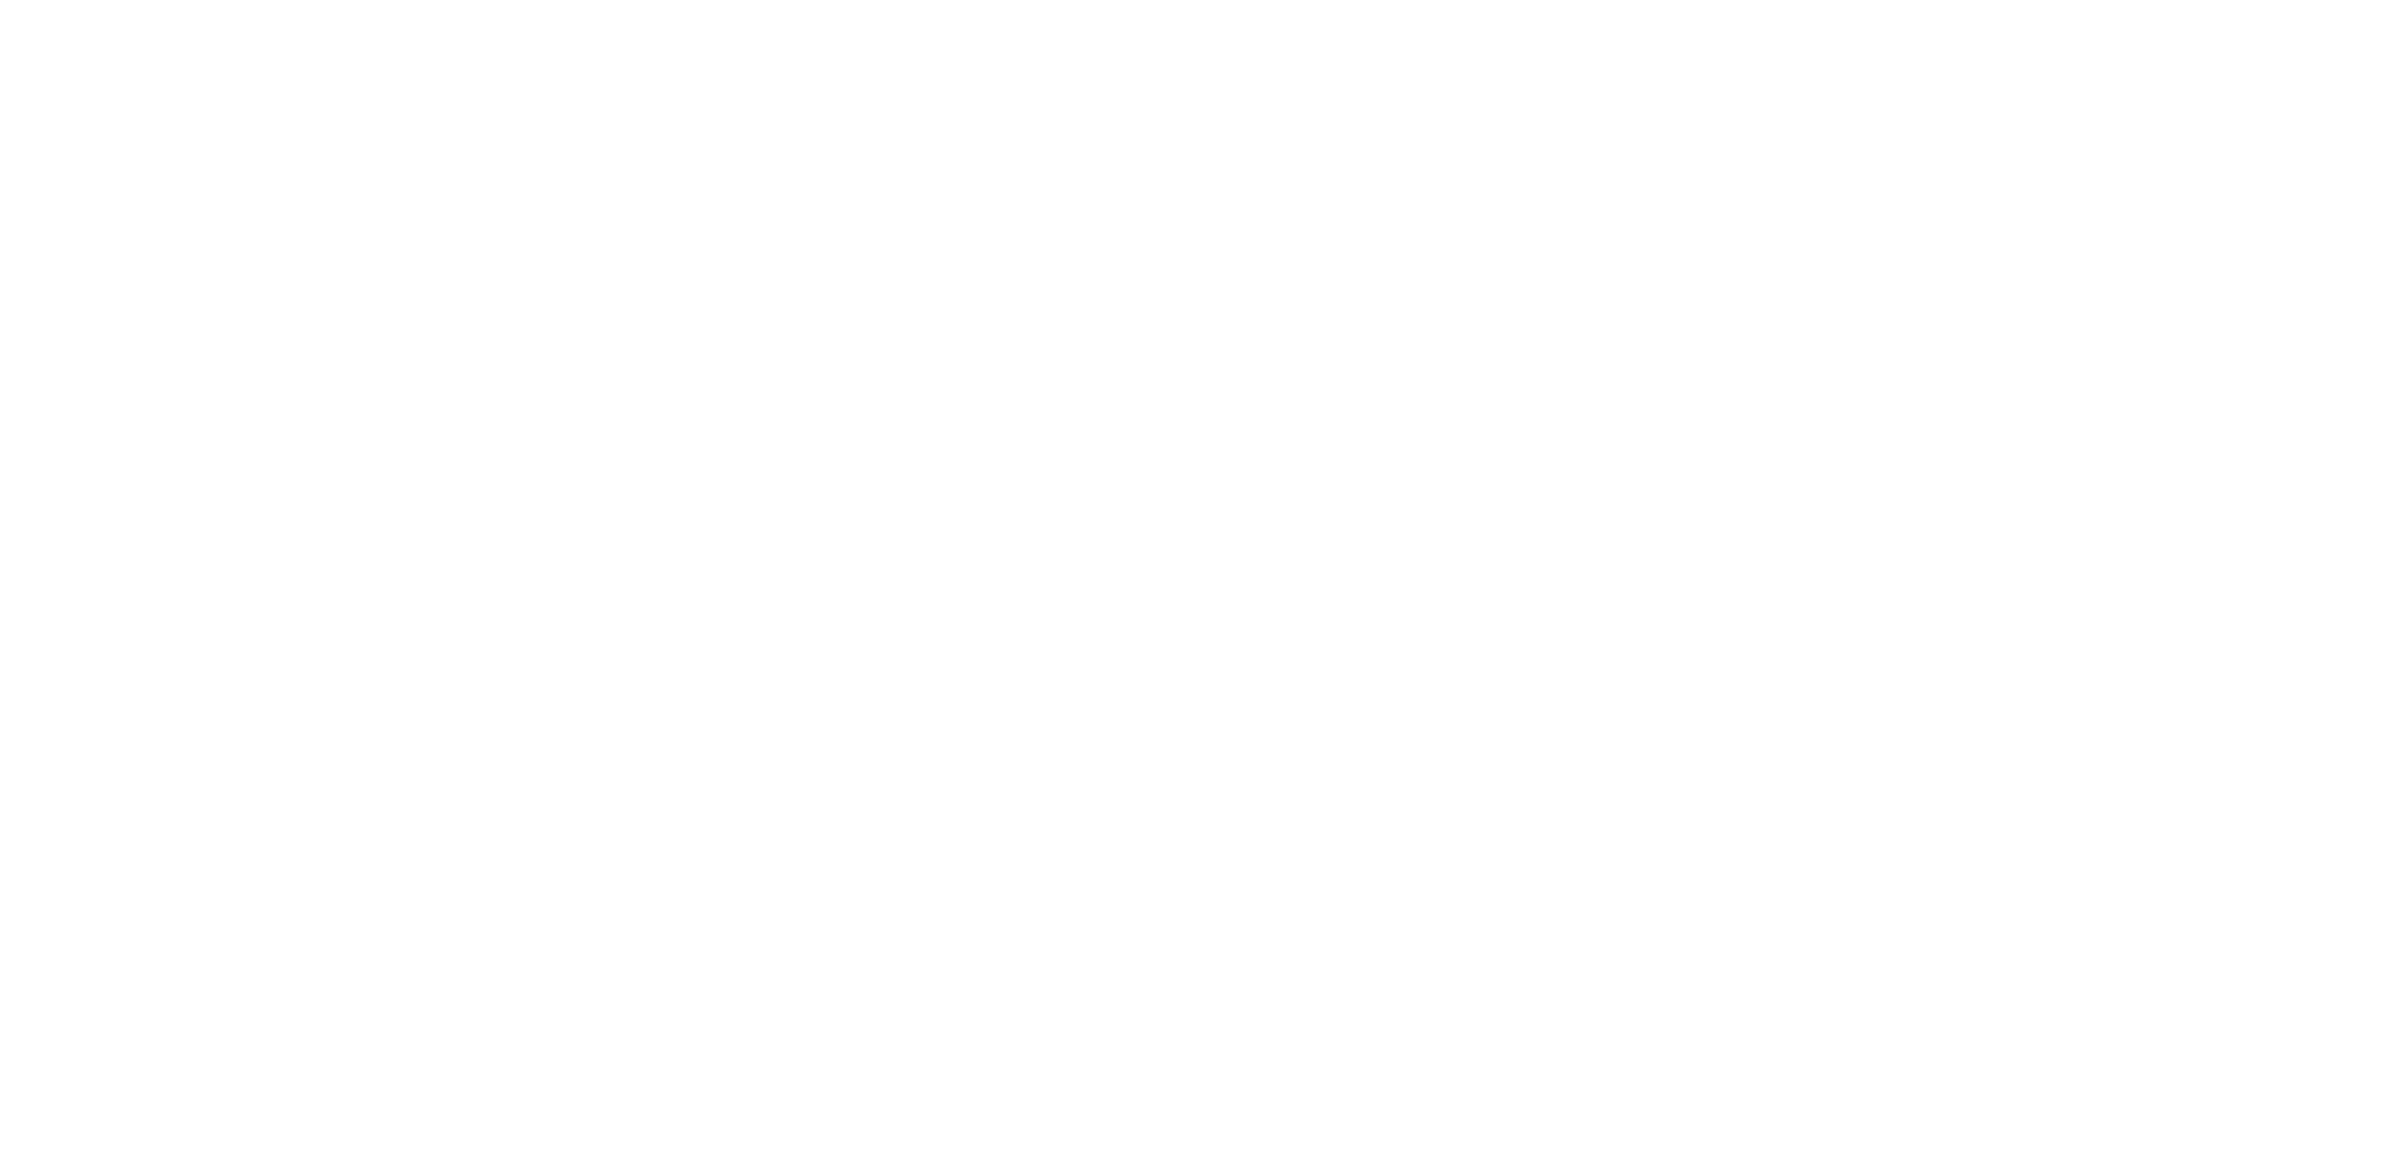 bbc-2-logo-png-transparent WHITE.png